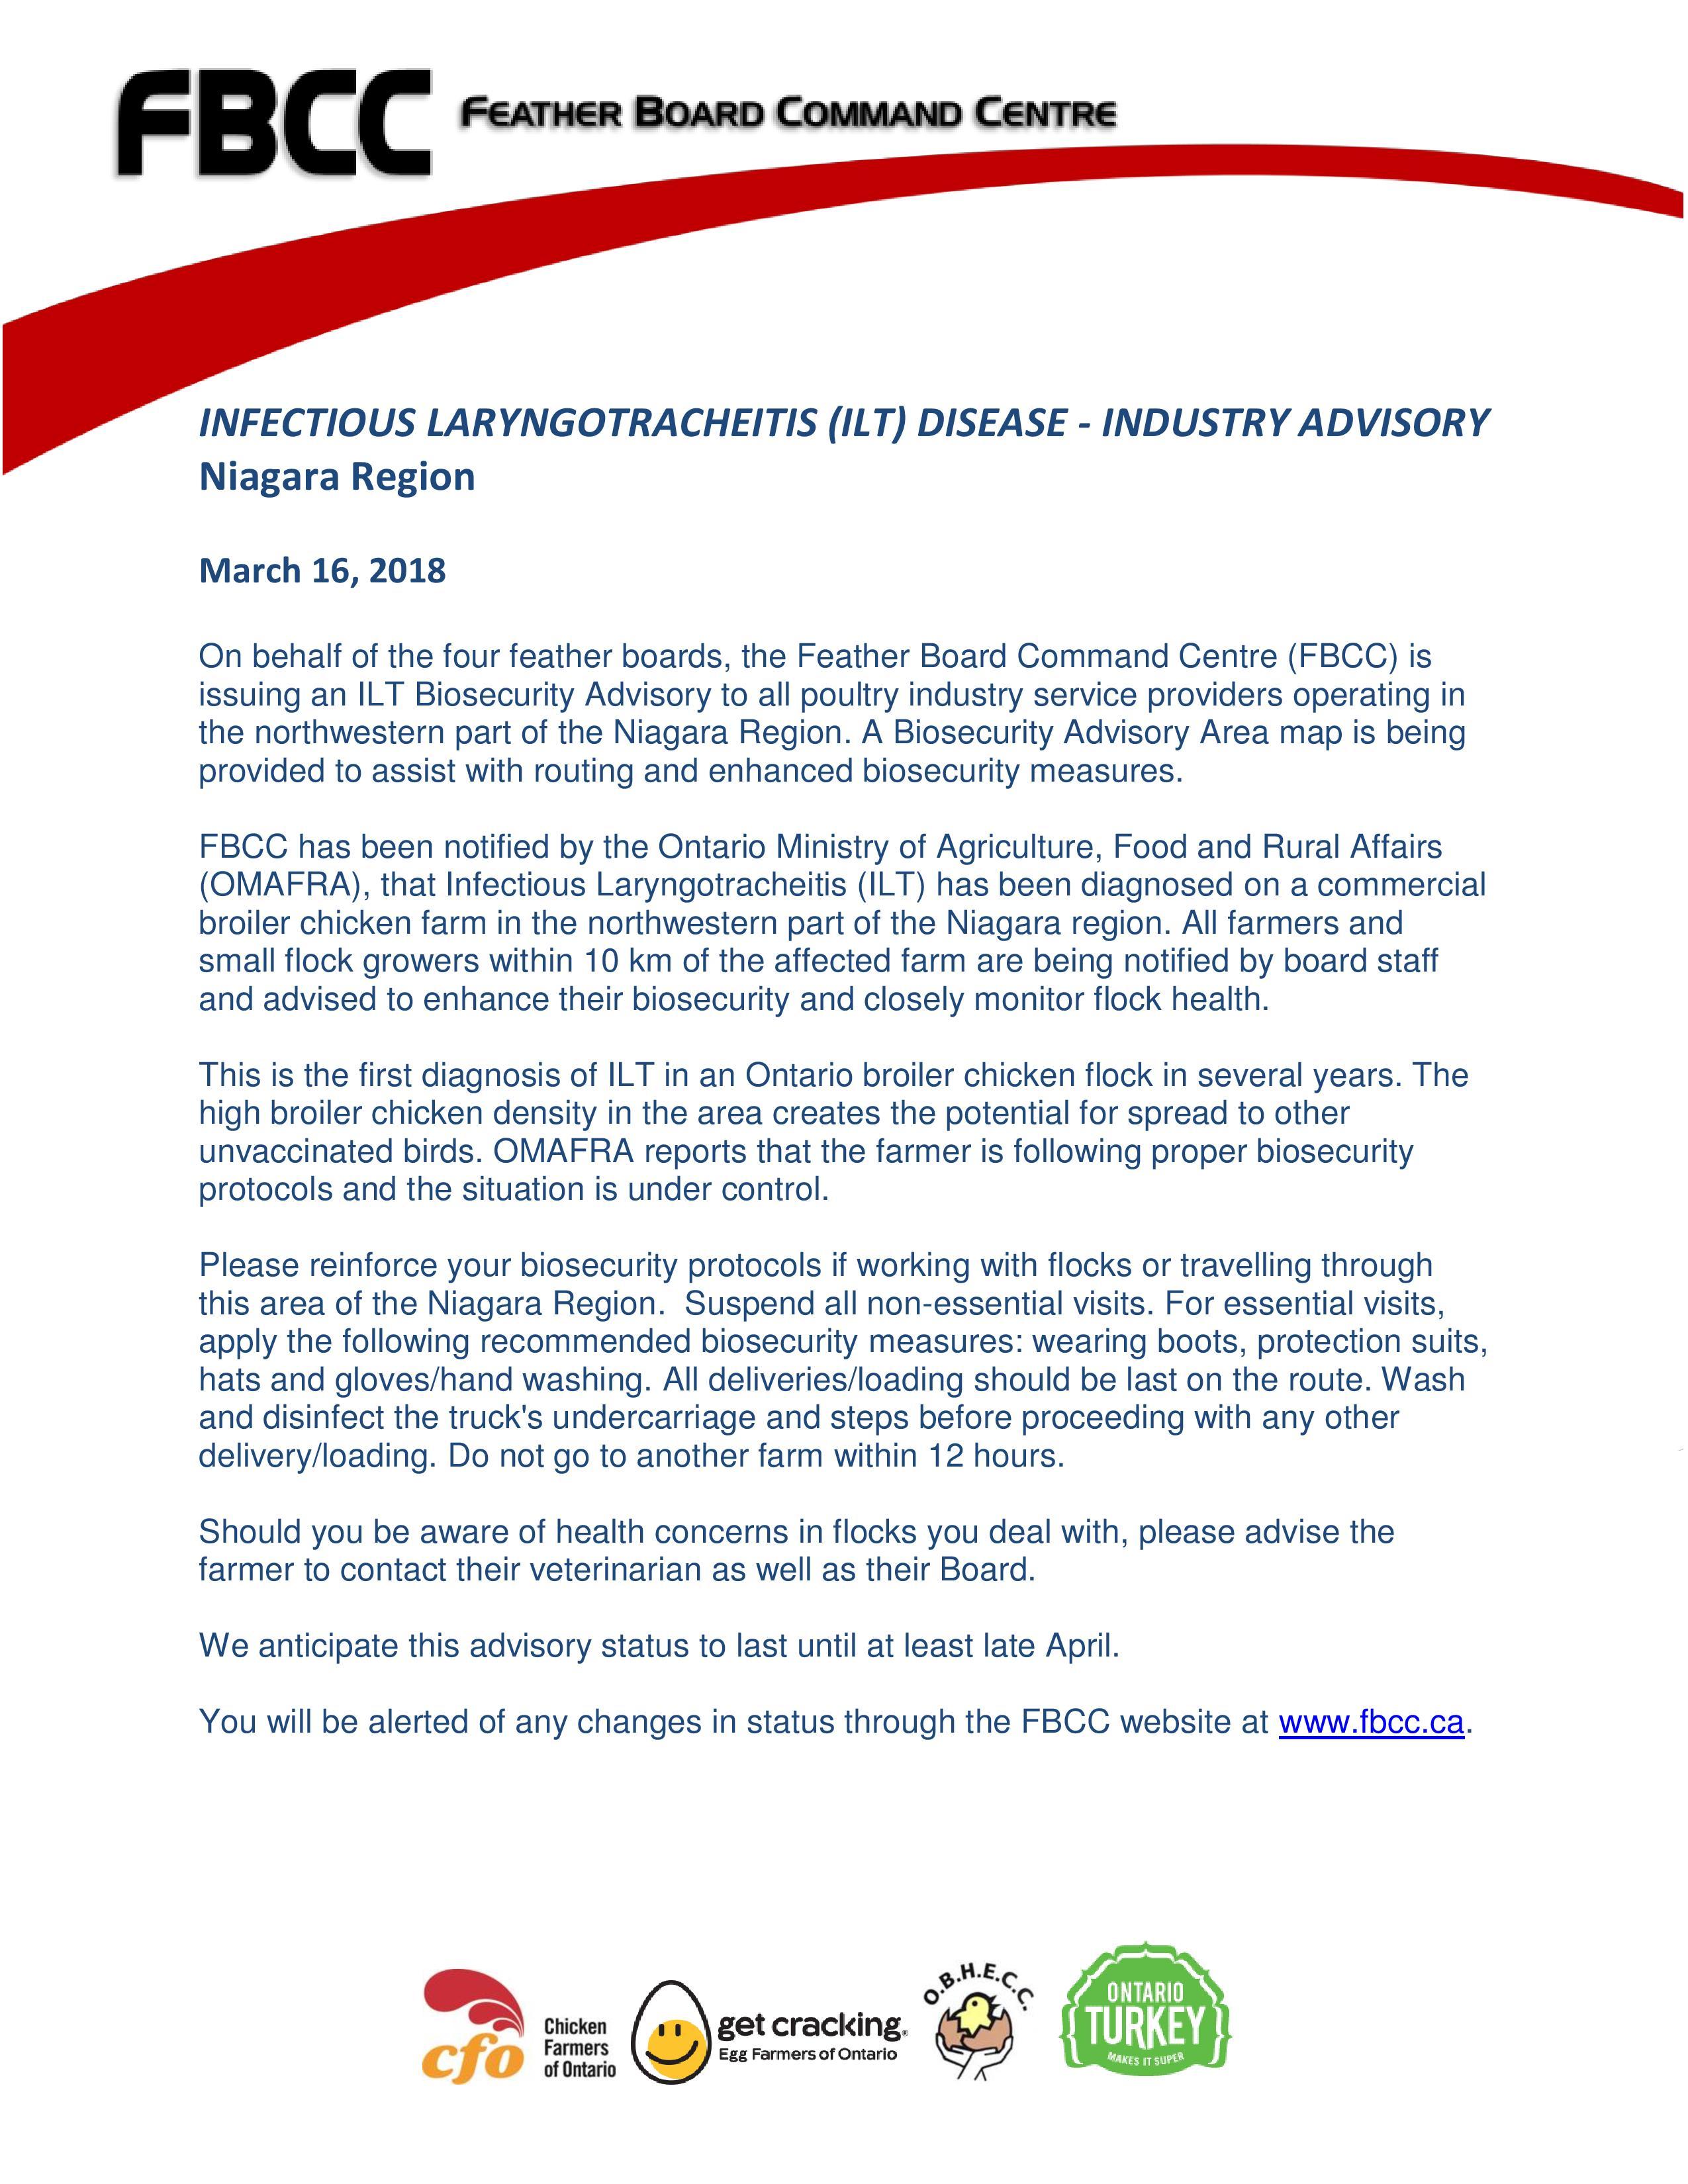 ilt biosecurity advisory for niagara region